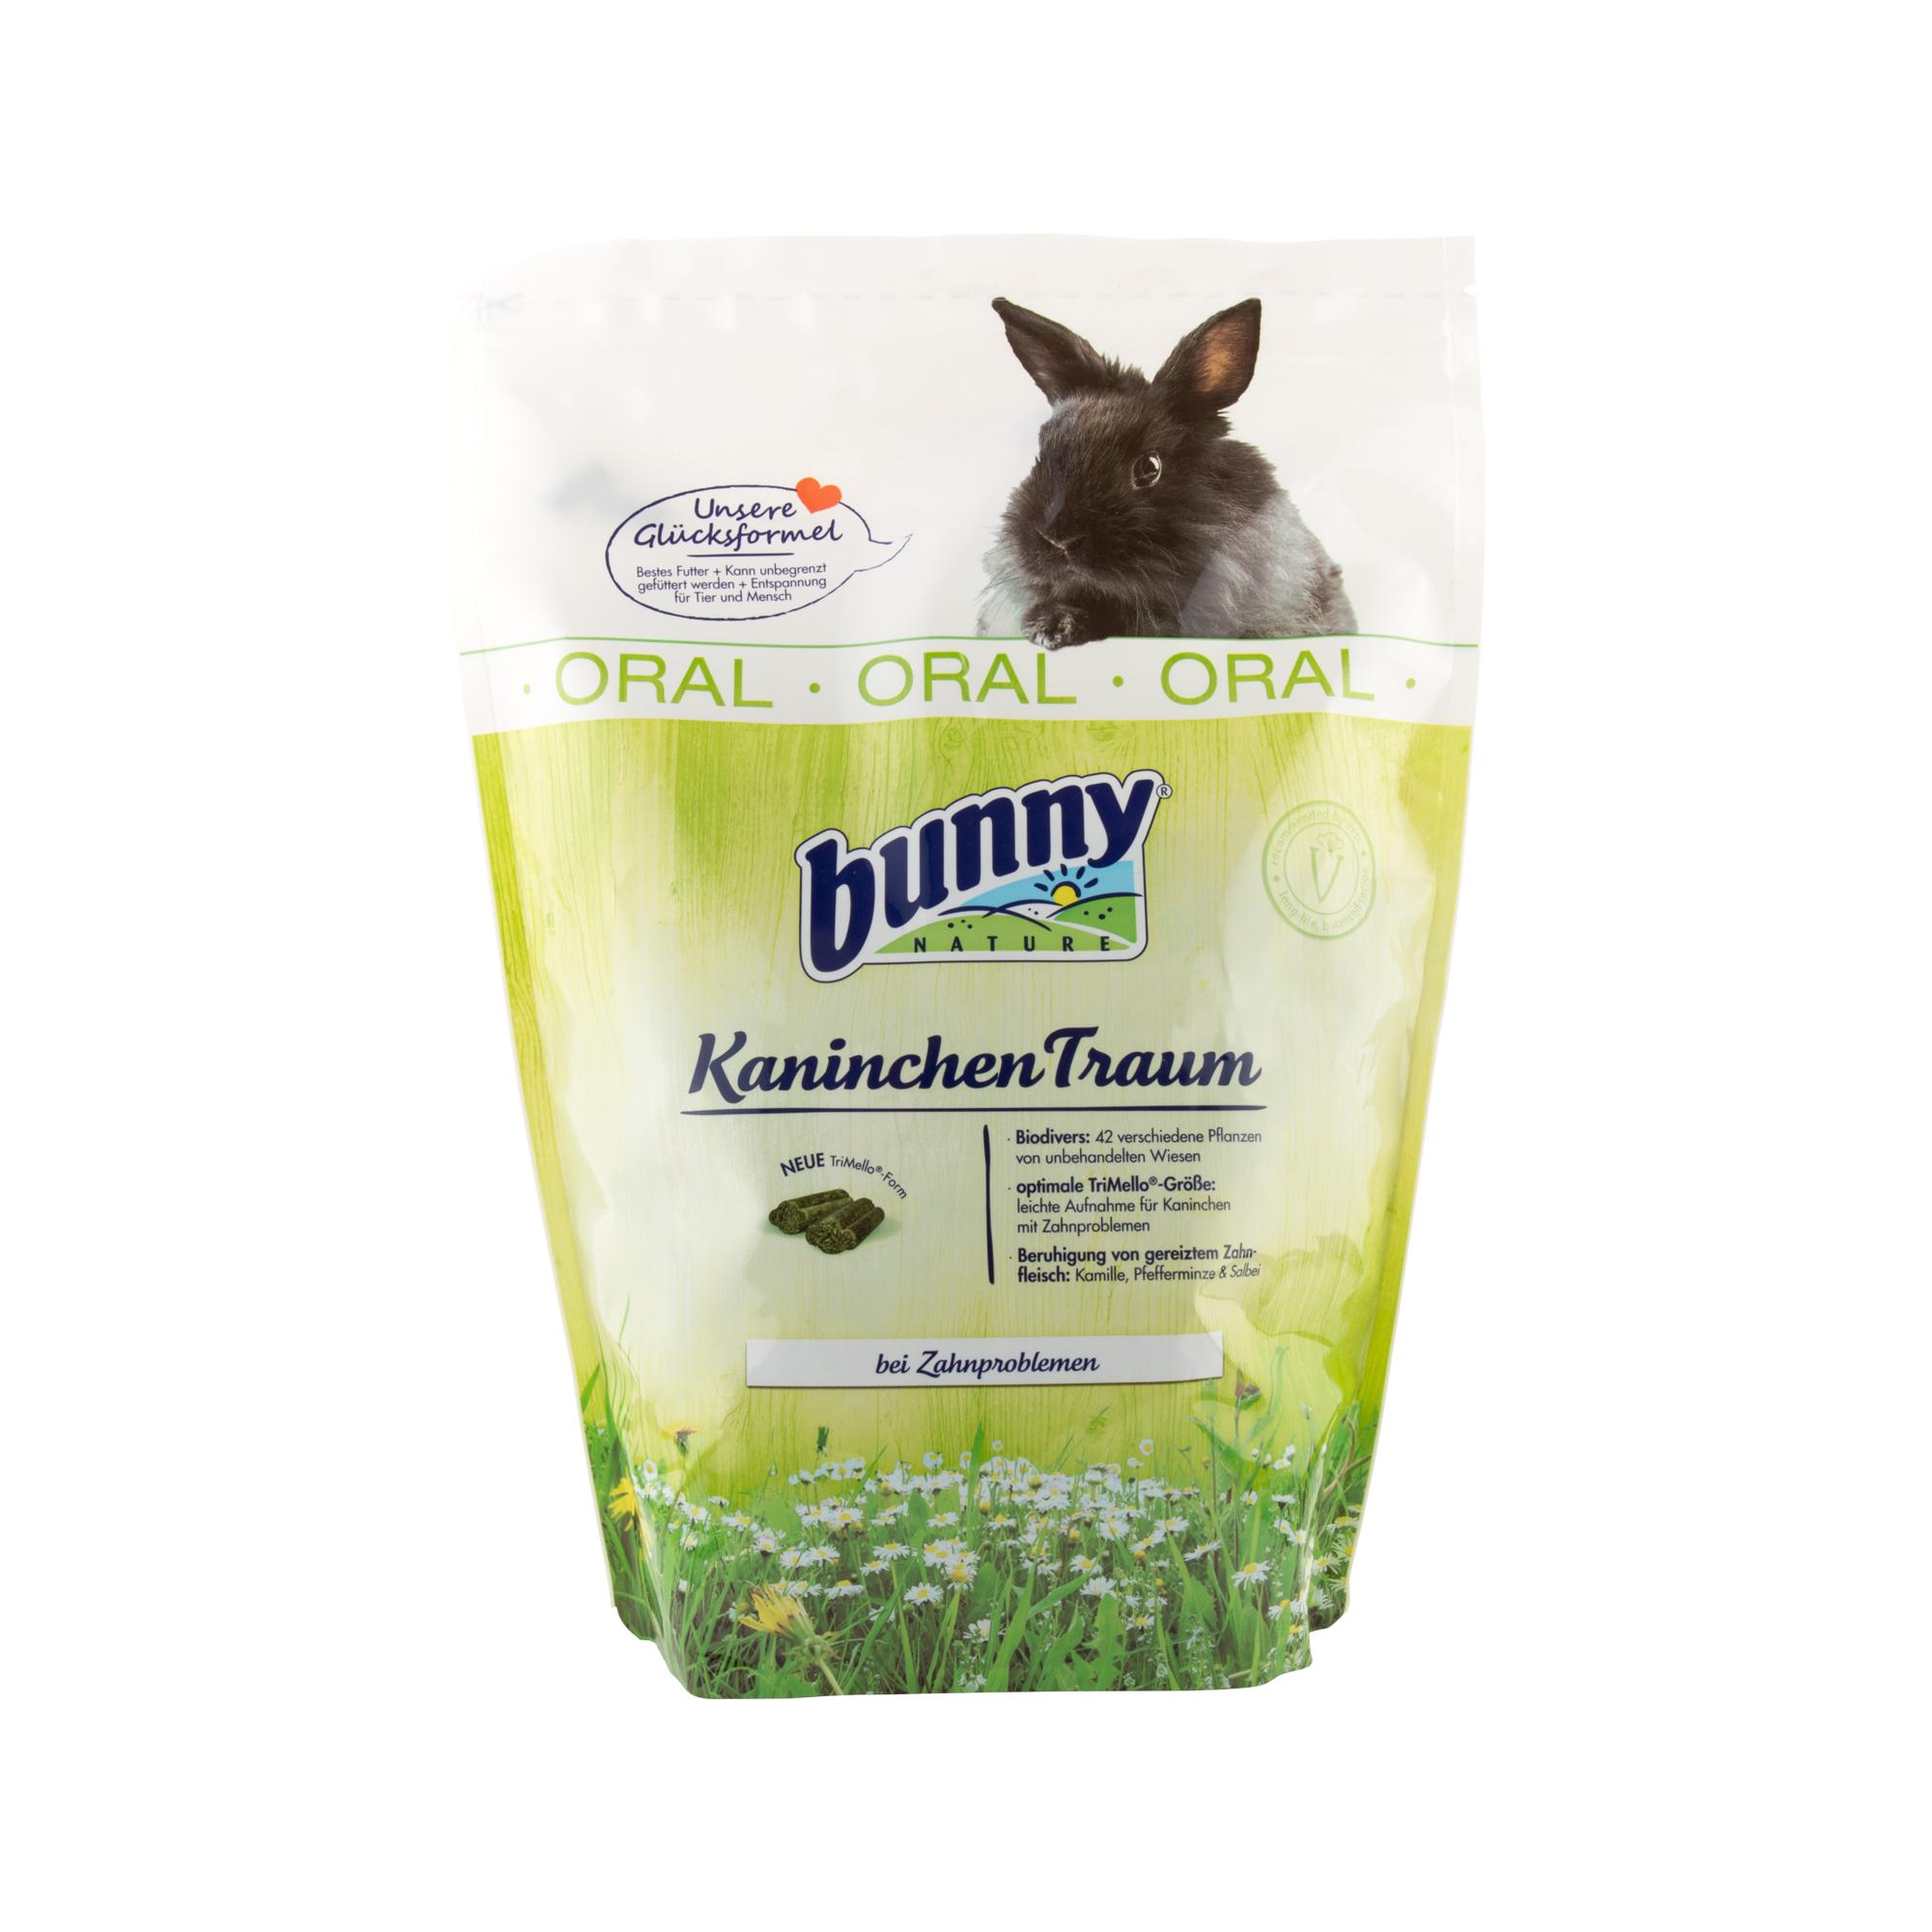 Bunny Nature - Rêve de lapin - Oral